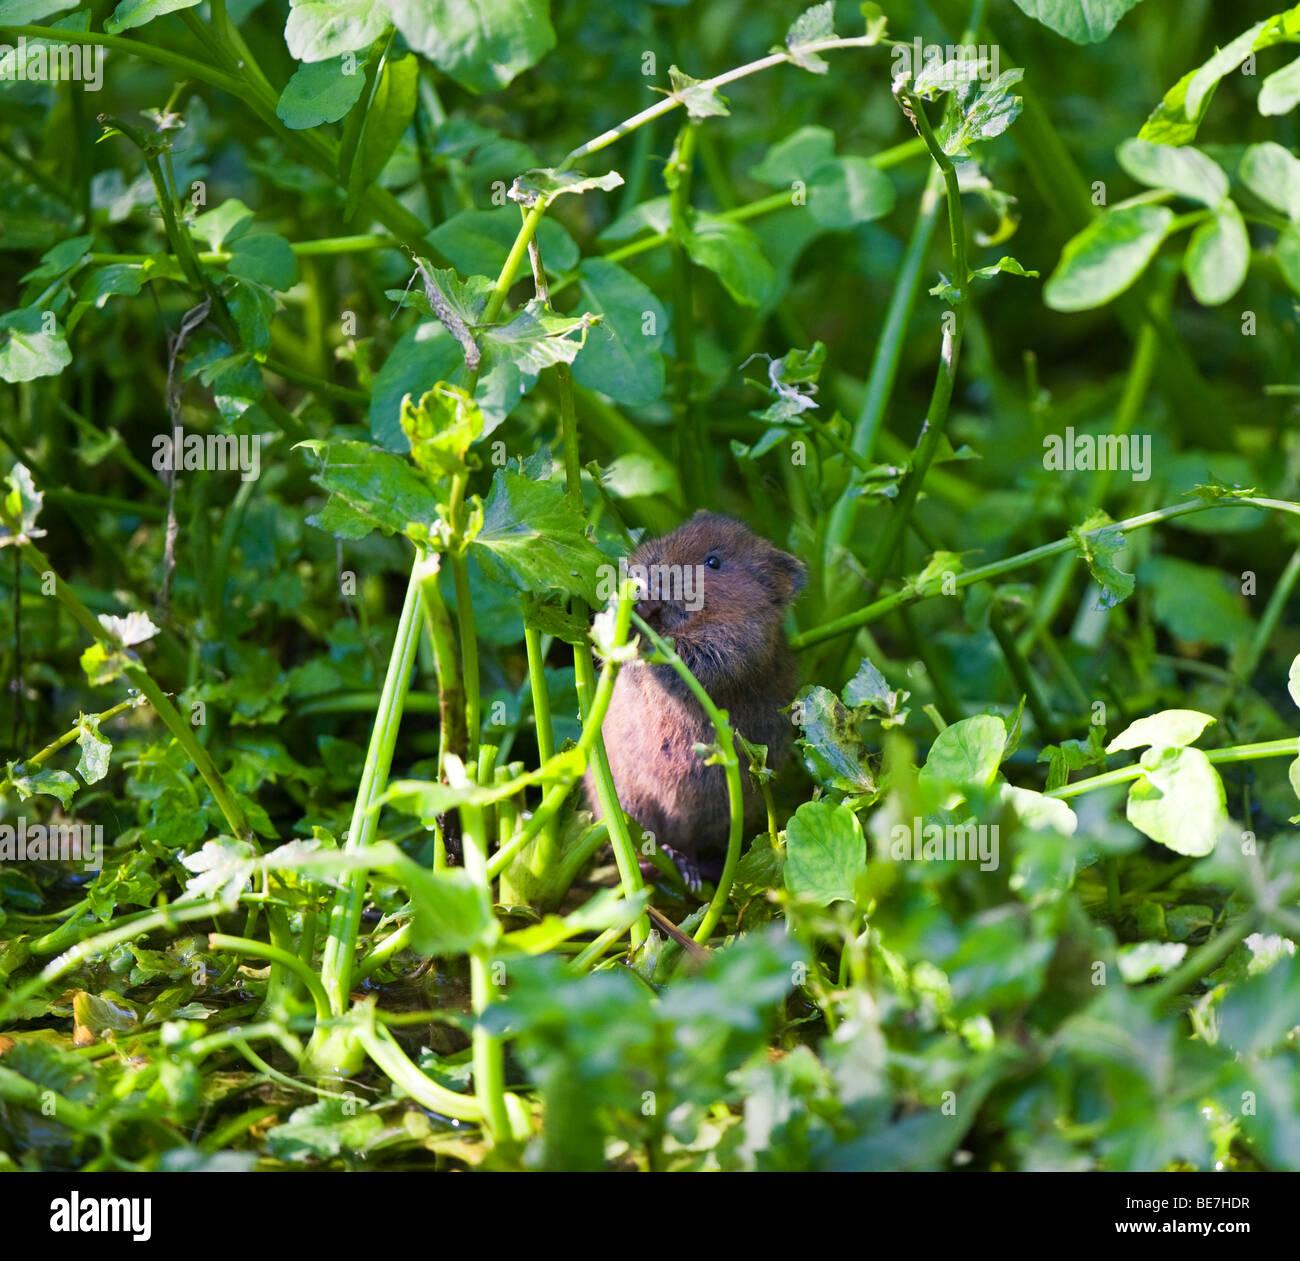 Water Vole - Arvicola terrestris - Stock Image